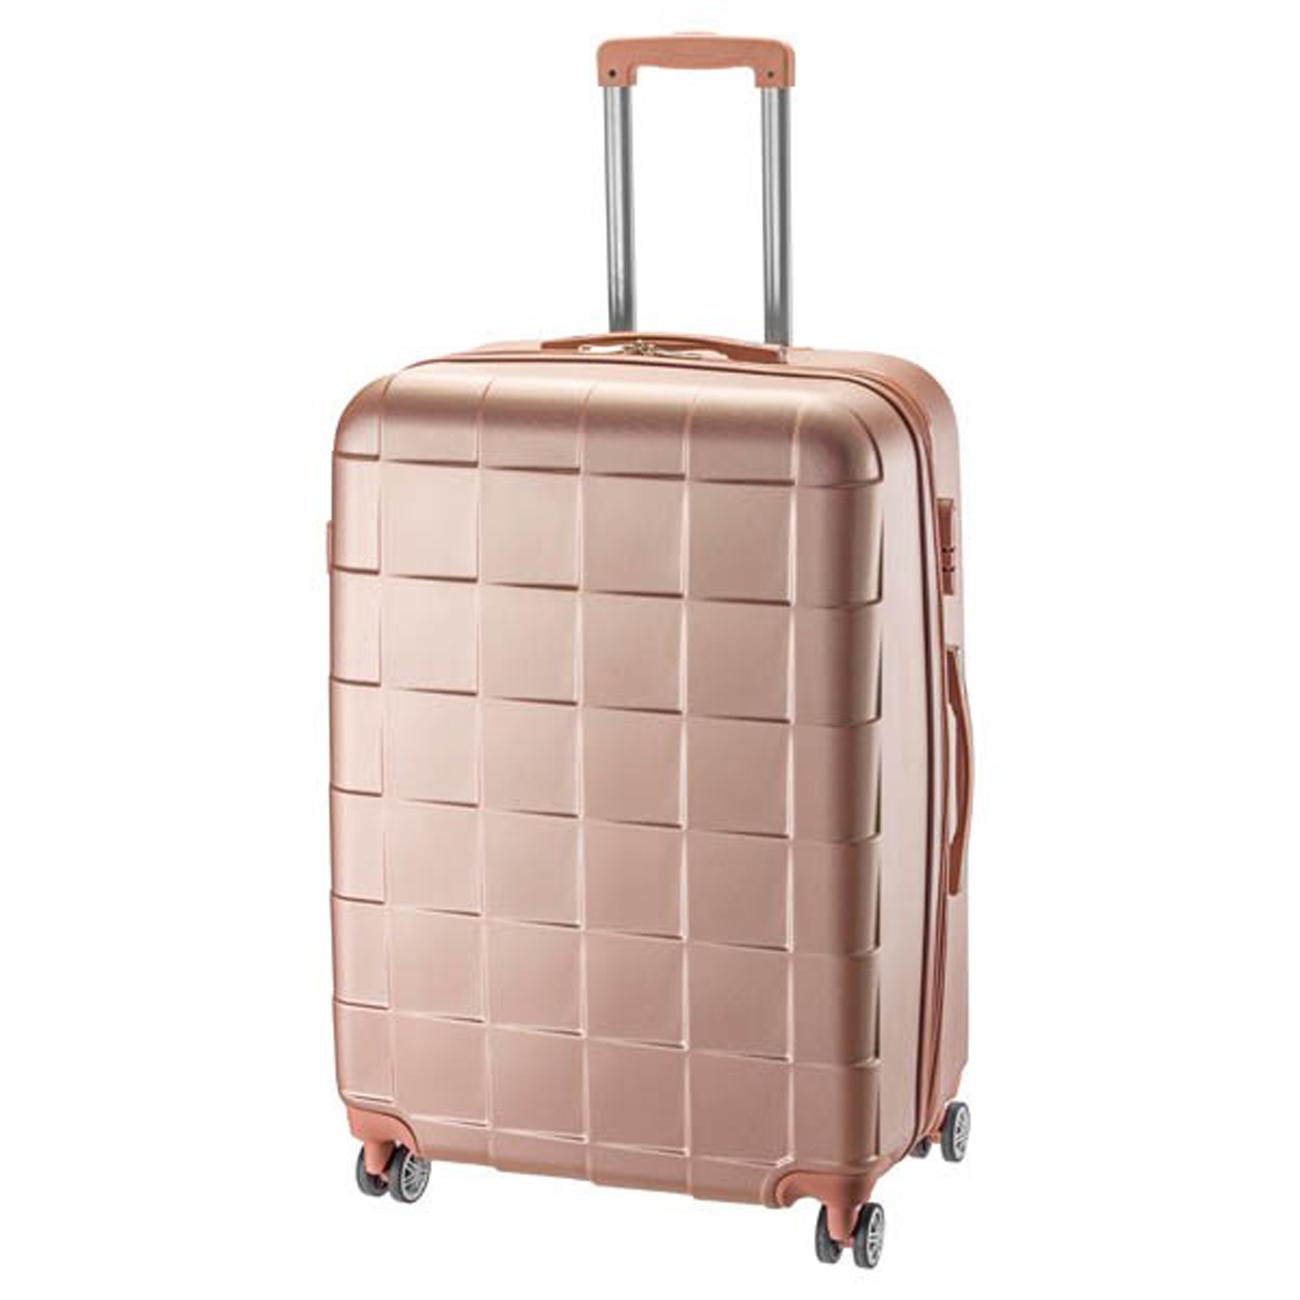 10c0fe3595 Βαλίτσα σκληρή ABS Μεγάλη με επέκταση Rcm 18-001-76-Ροζ - Γυναικειες τσαντες